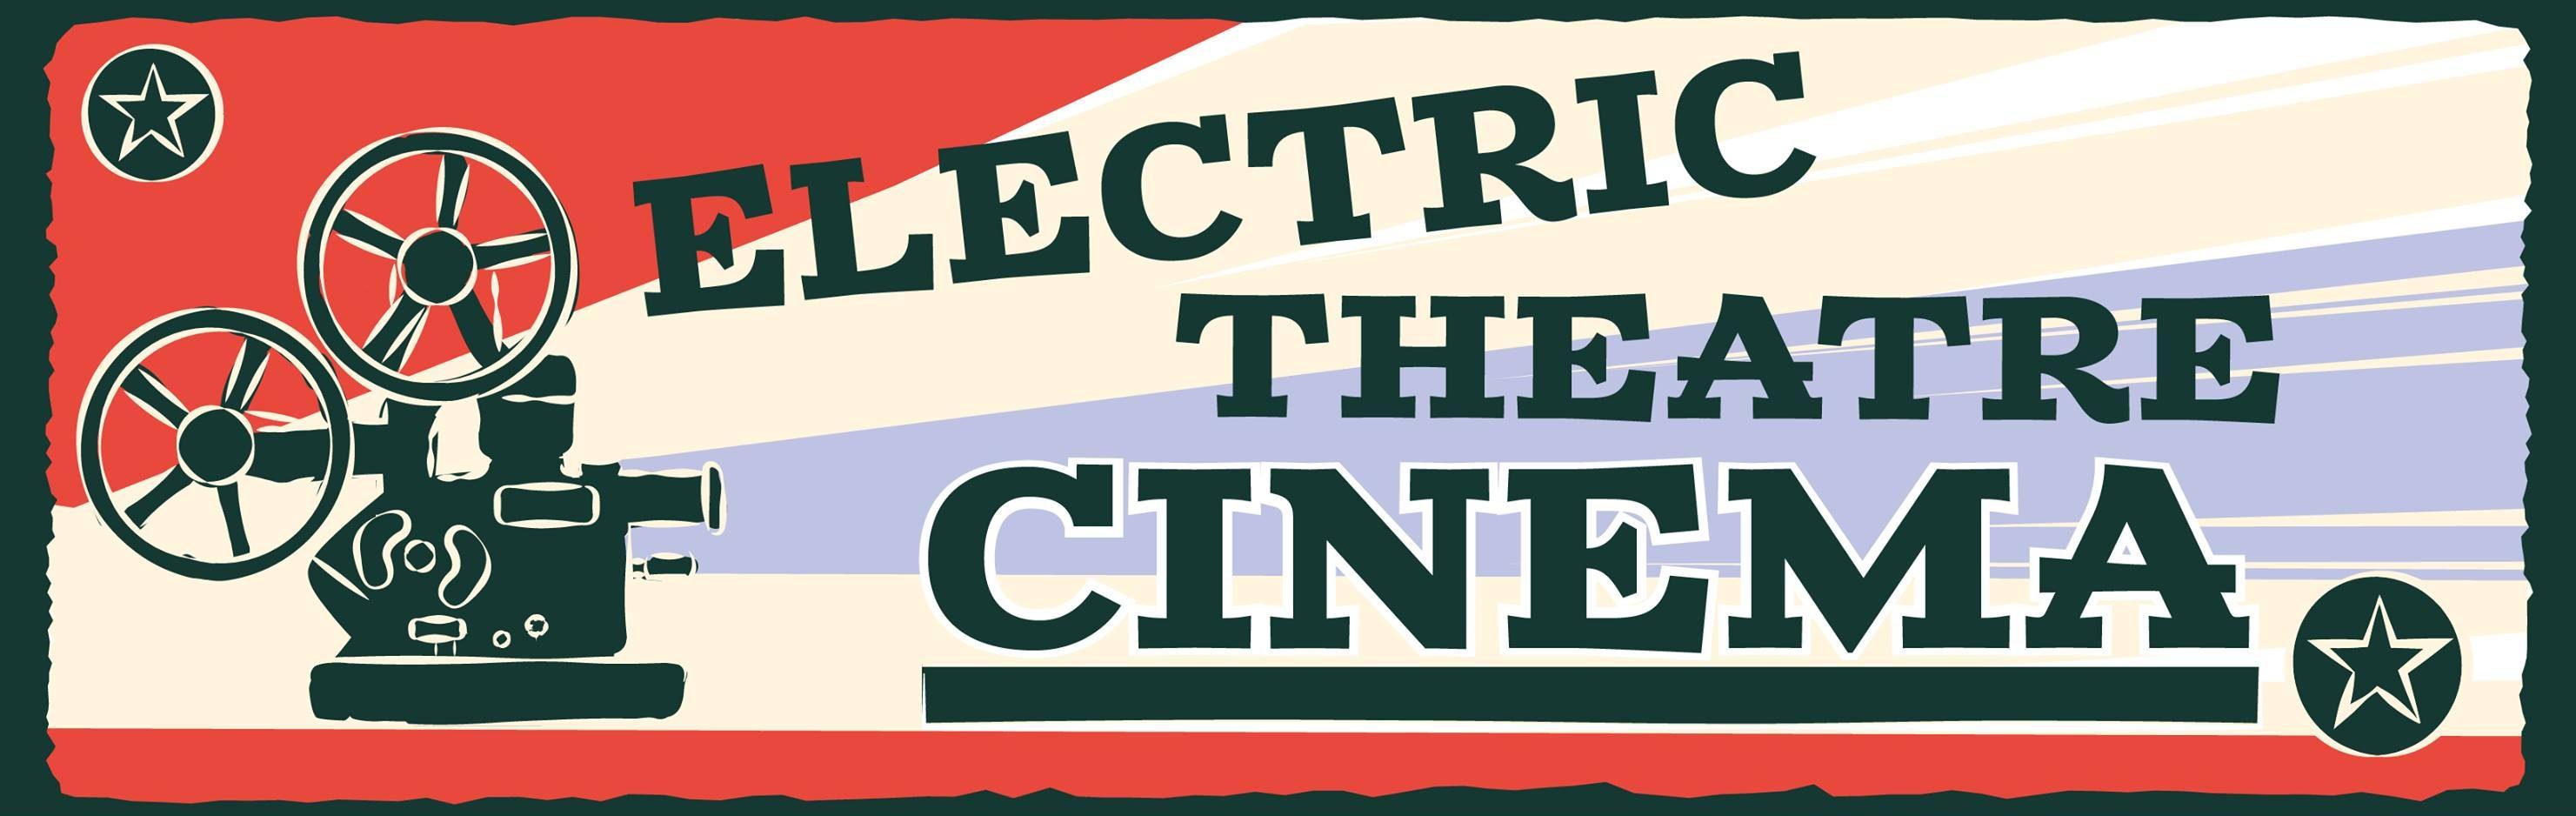 Electric Theatre Cinema